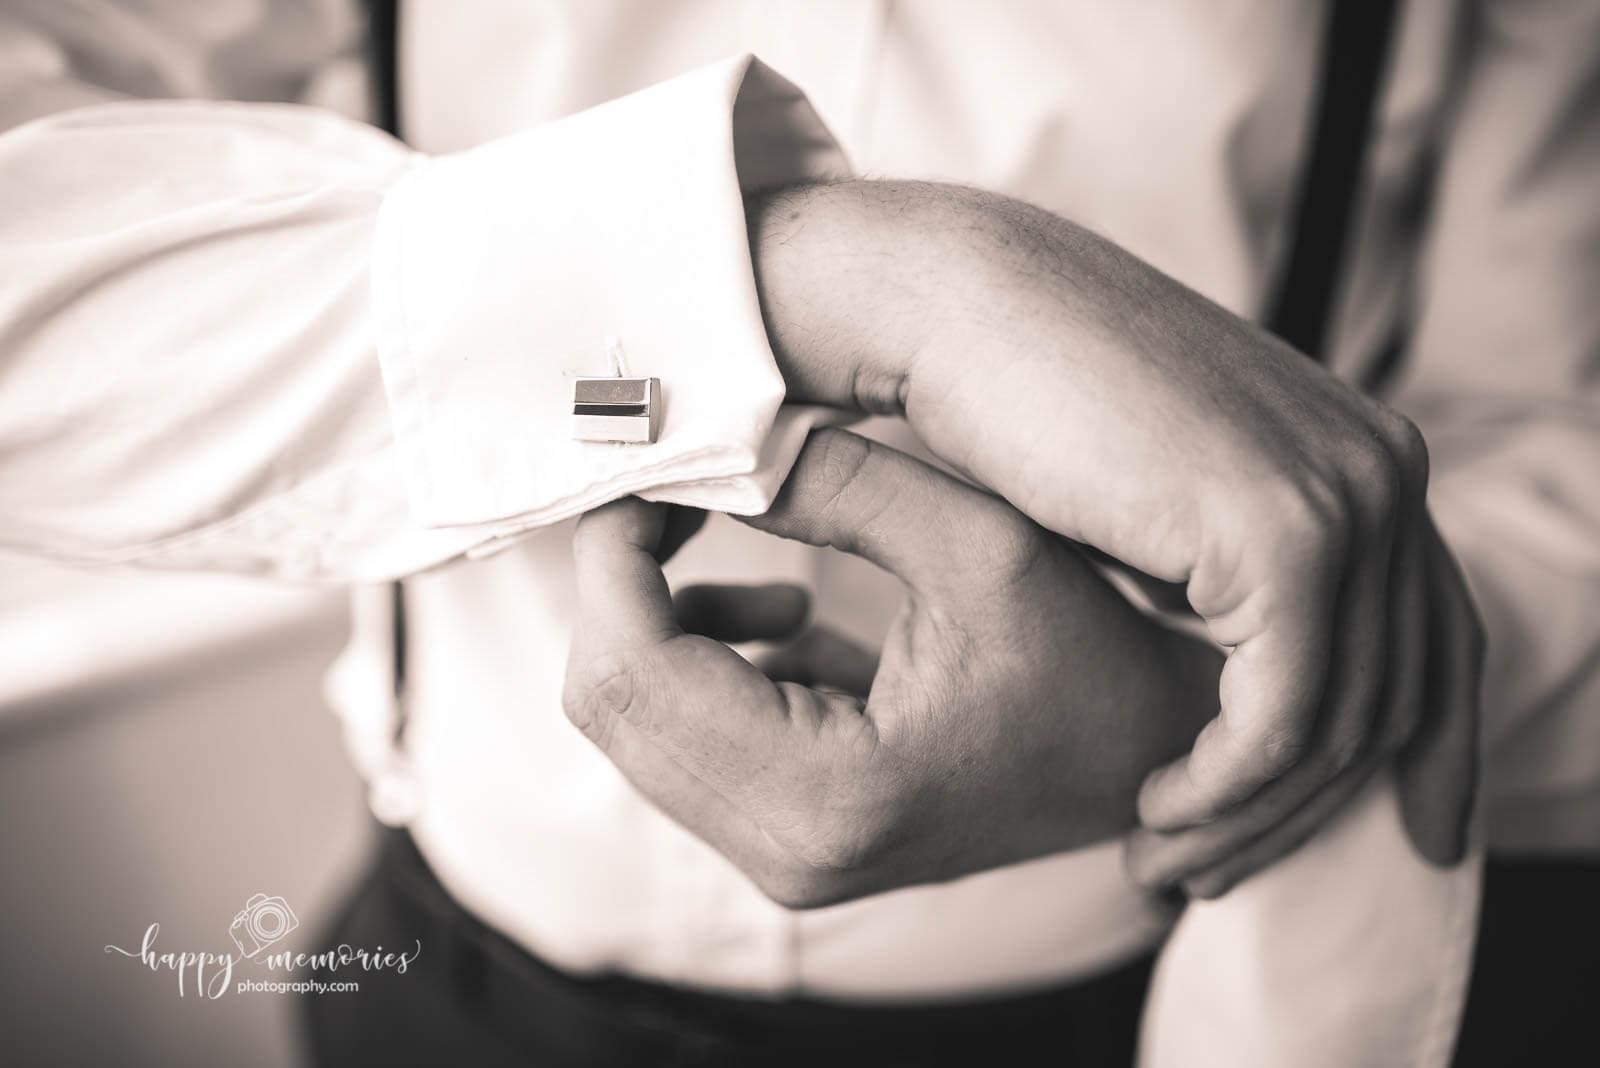 Wedding photographer East Grinstead-13